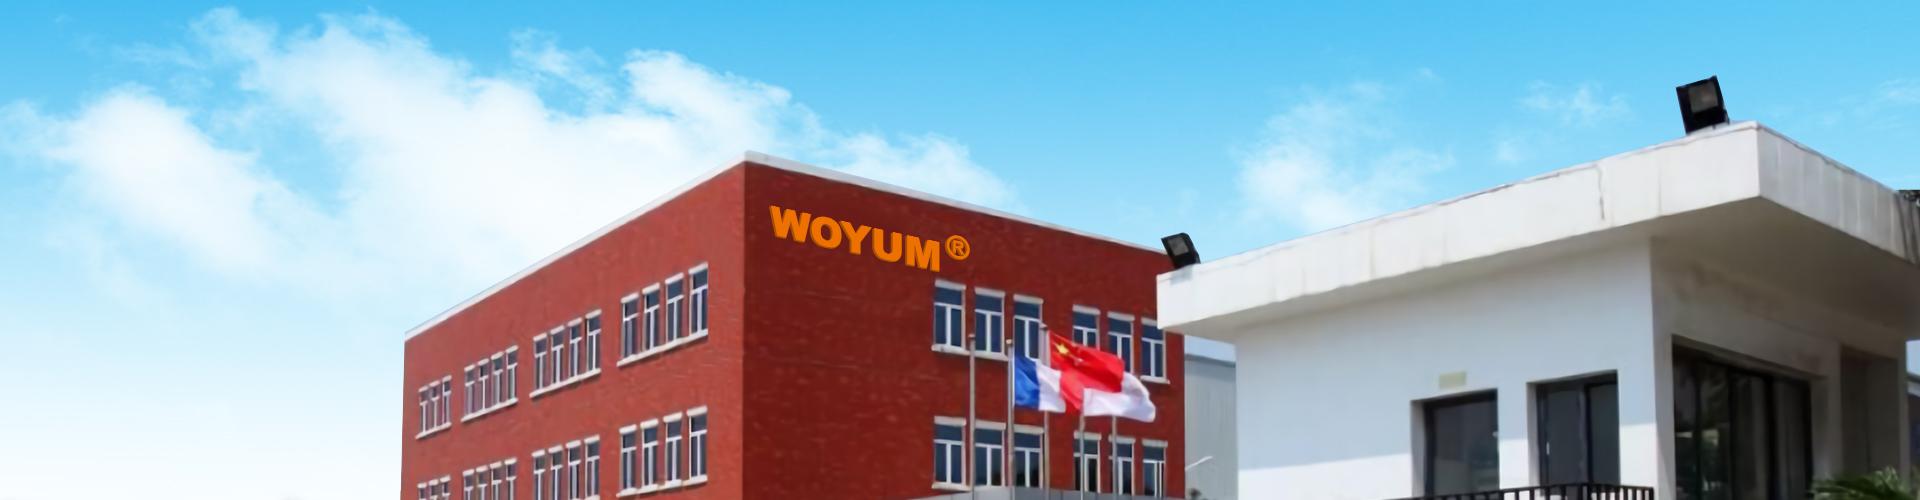 news-Team building B-Woyum-img